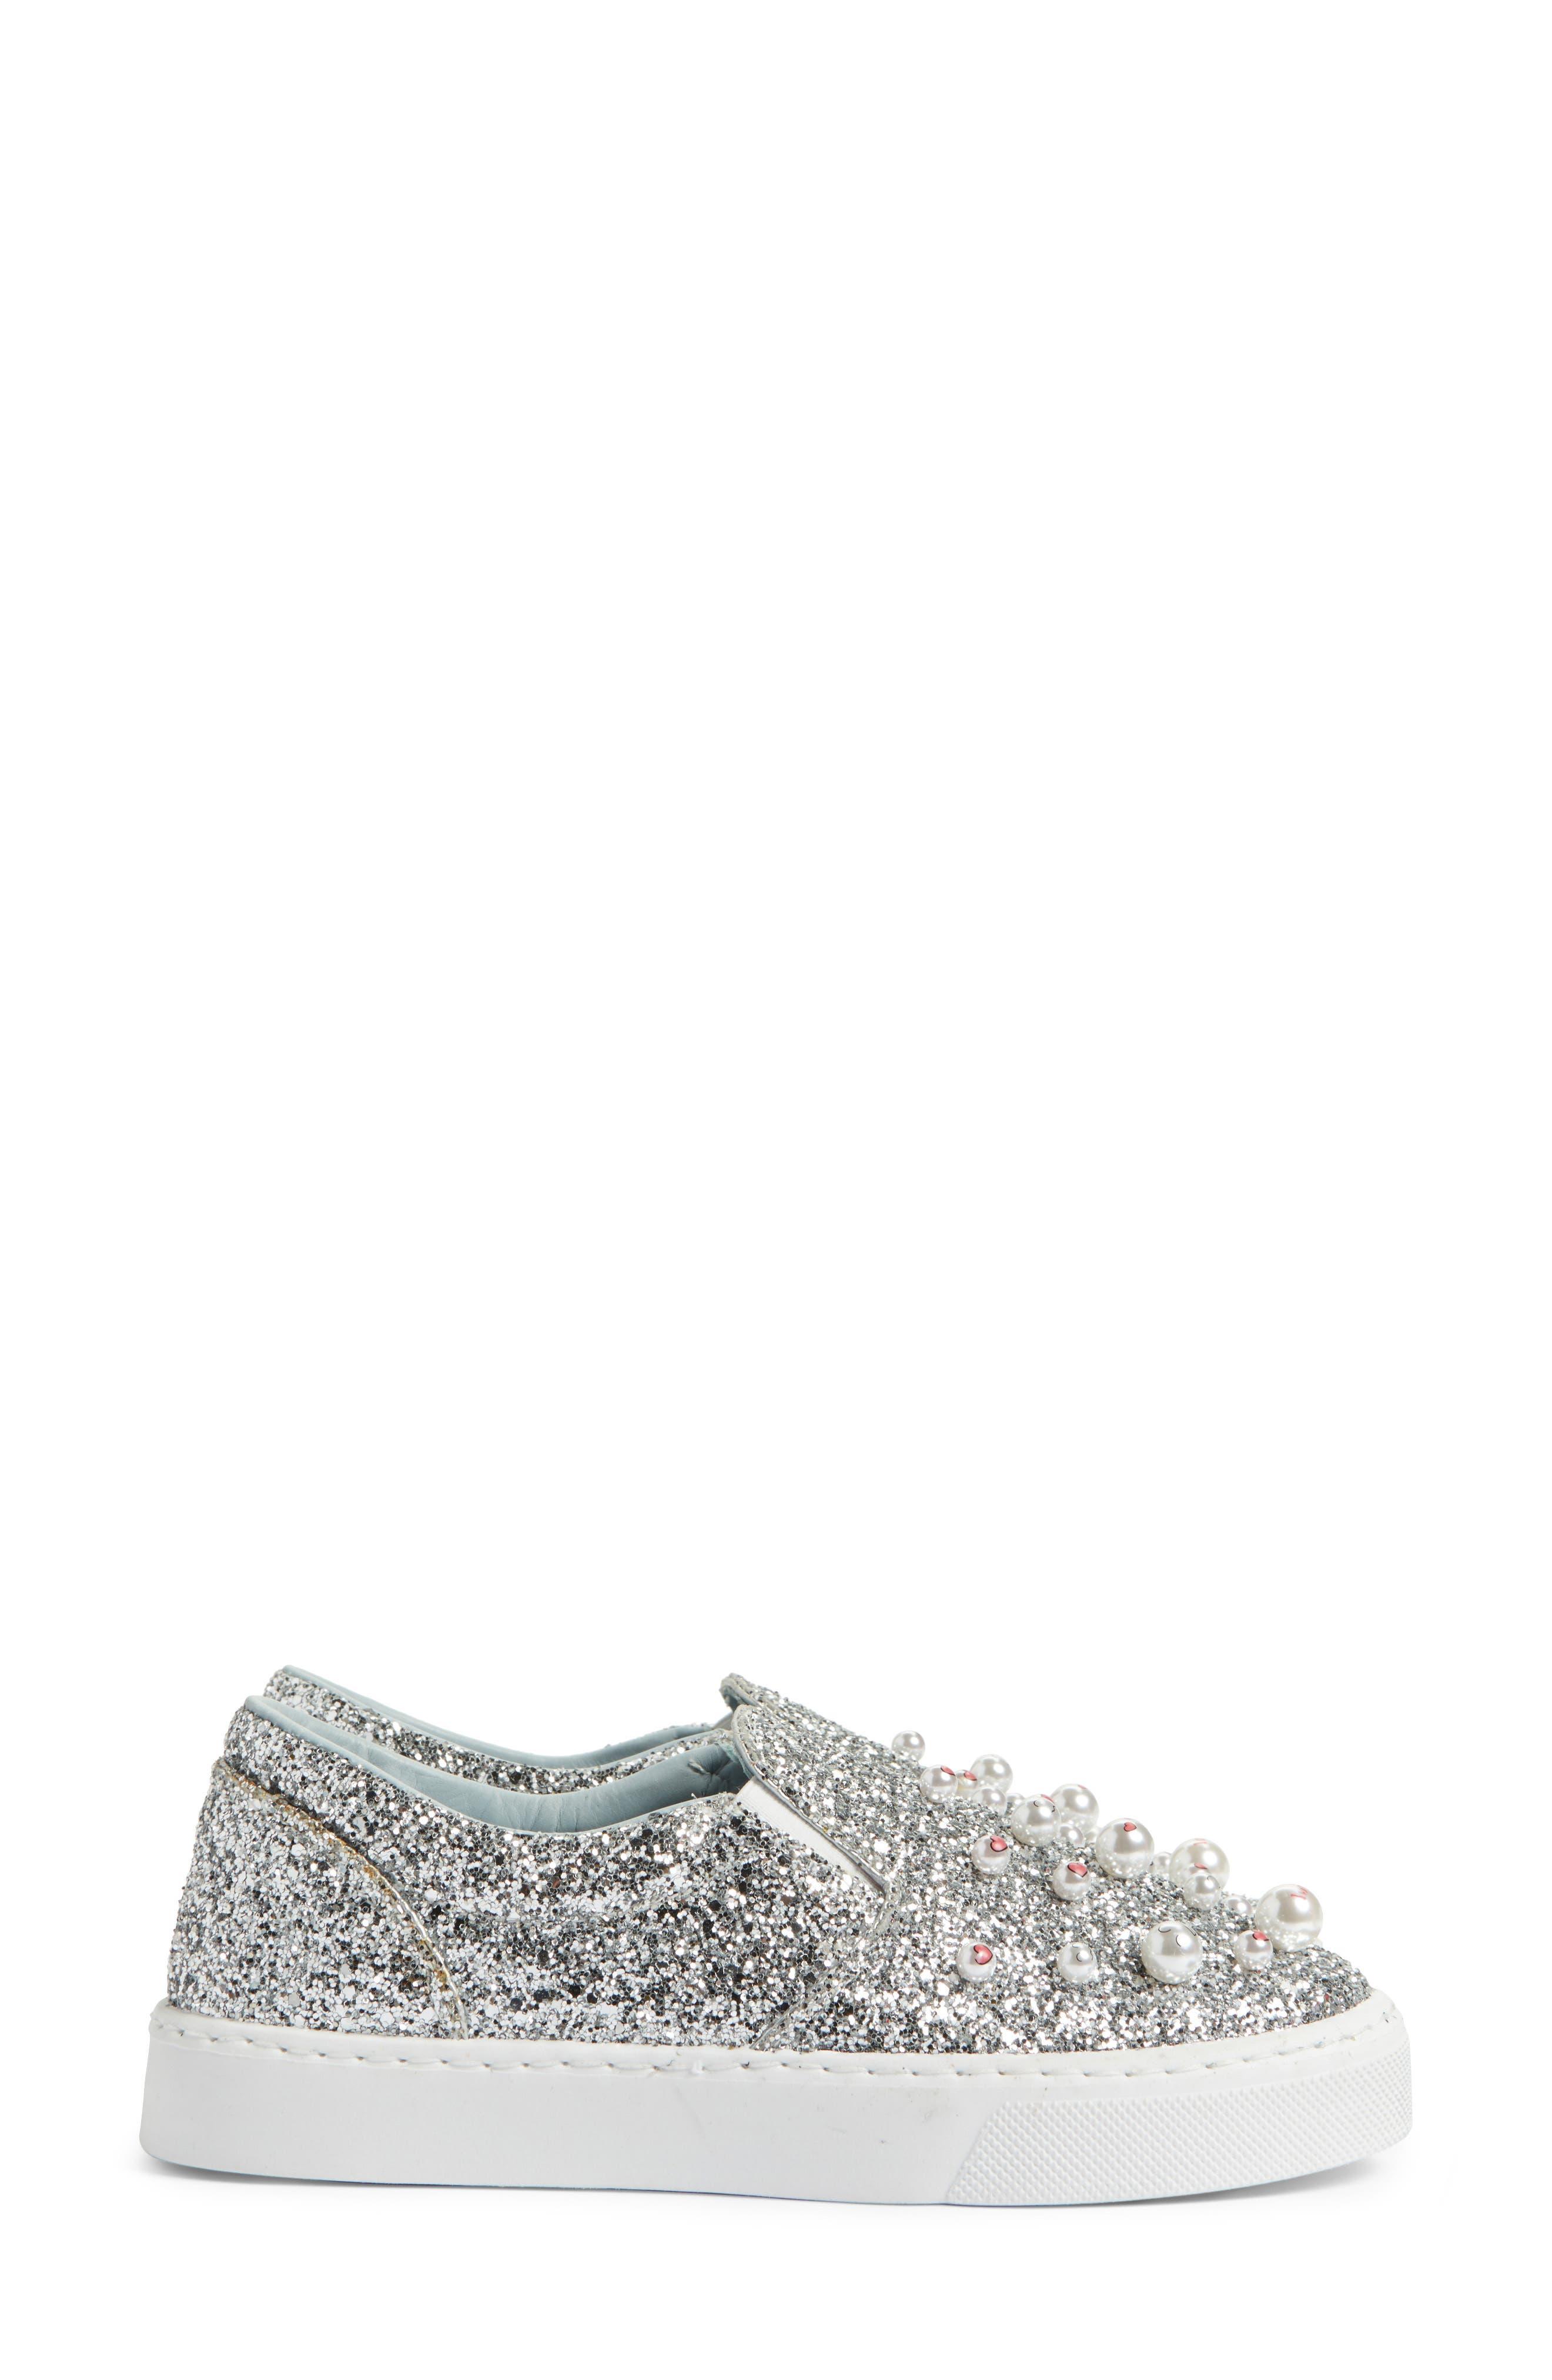 Candies Embellished Slip-On Sneaker,                             Alternate thumbnail 4, color,                             Silver